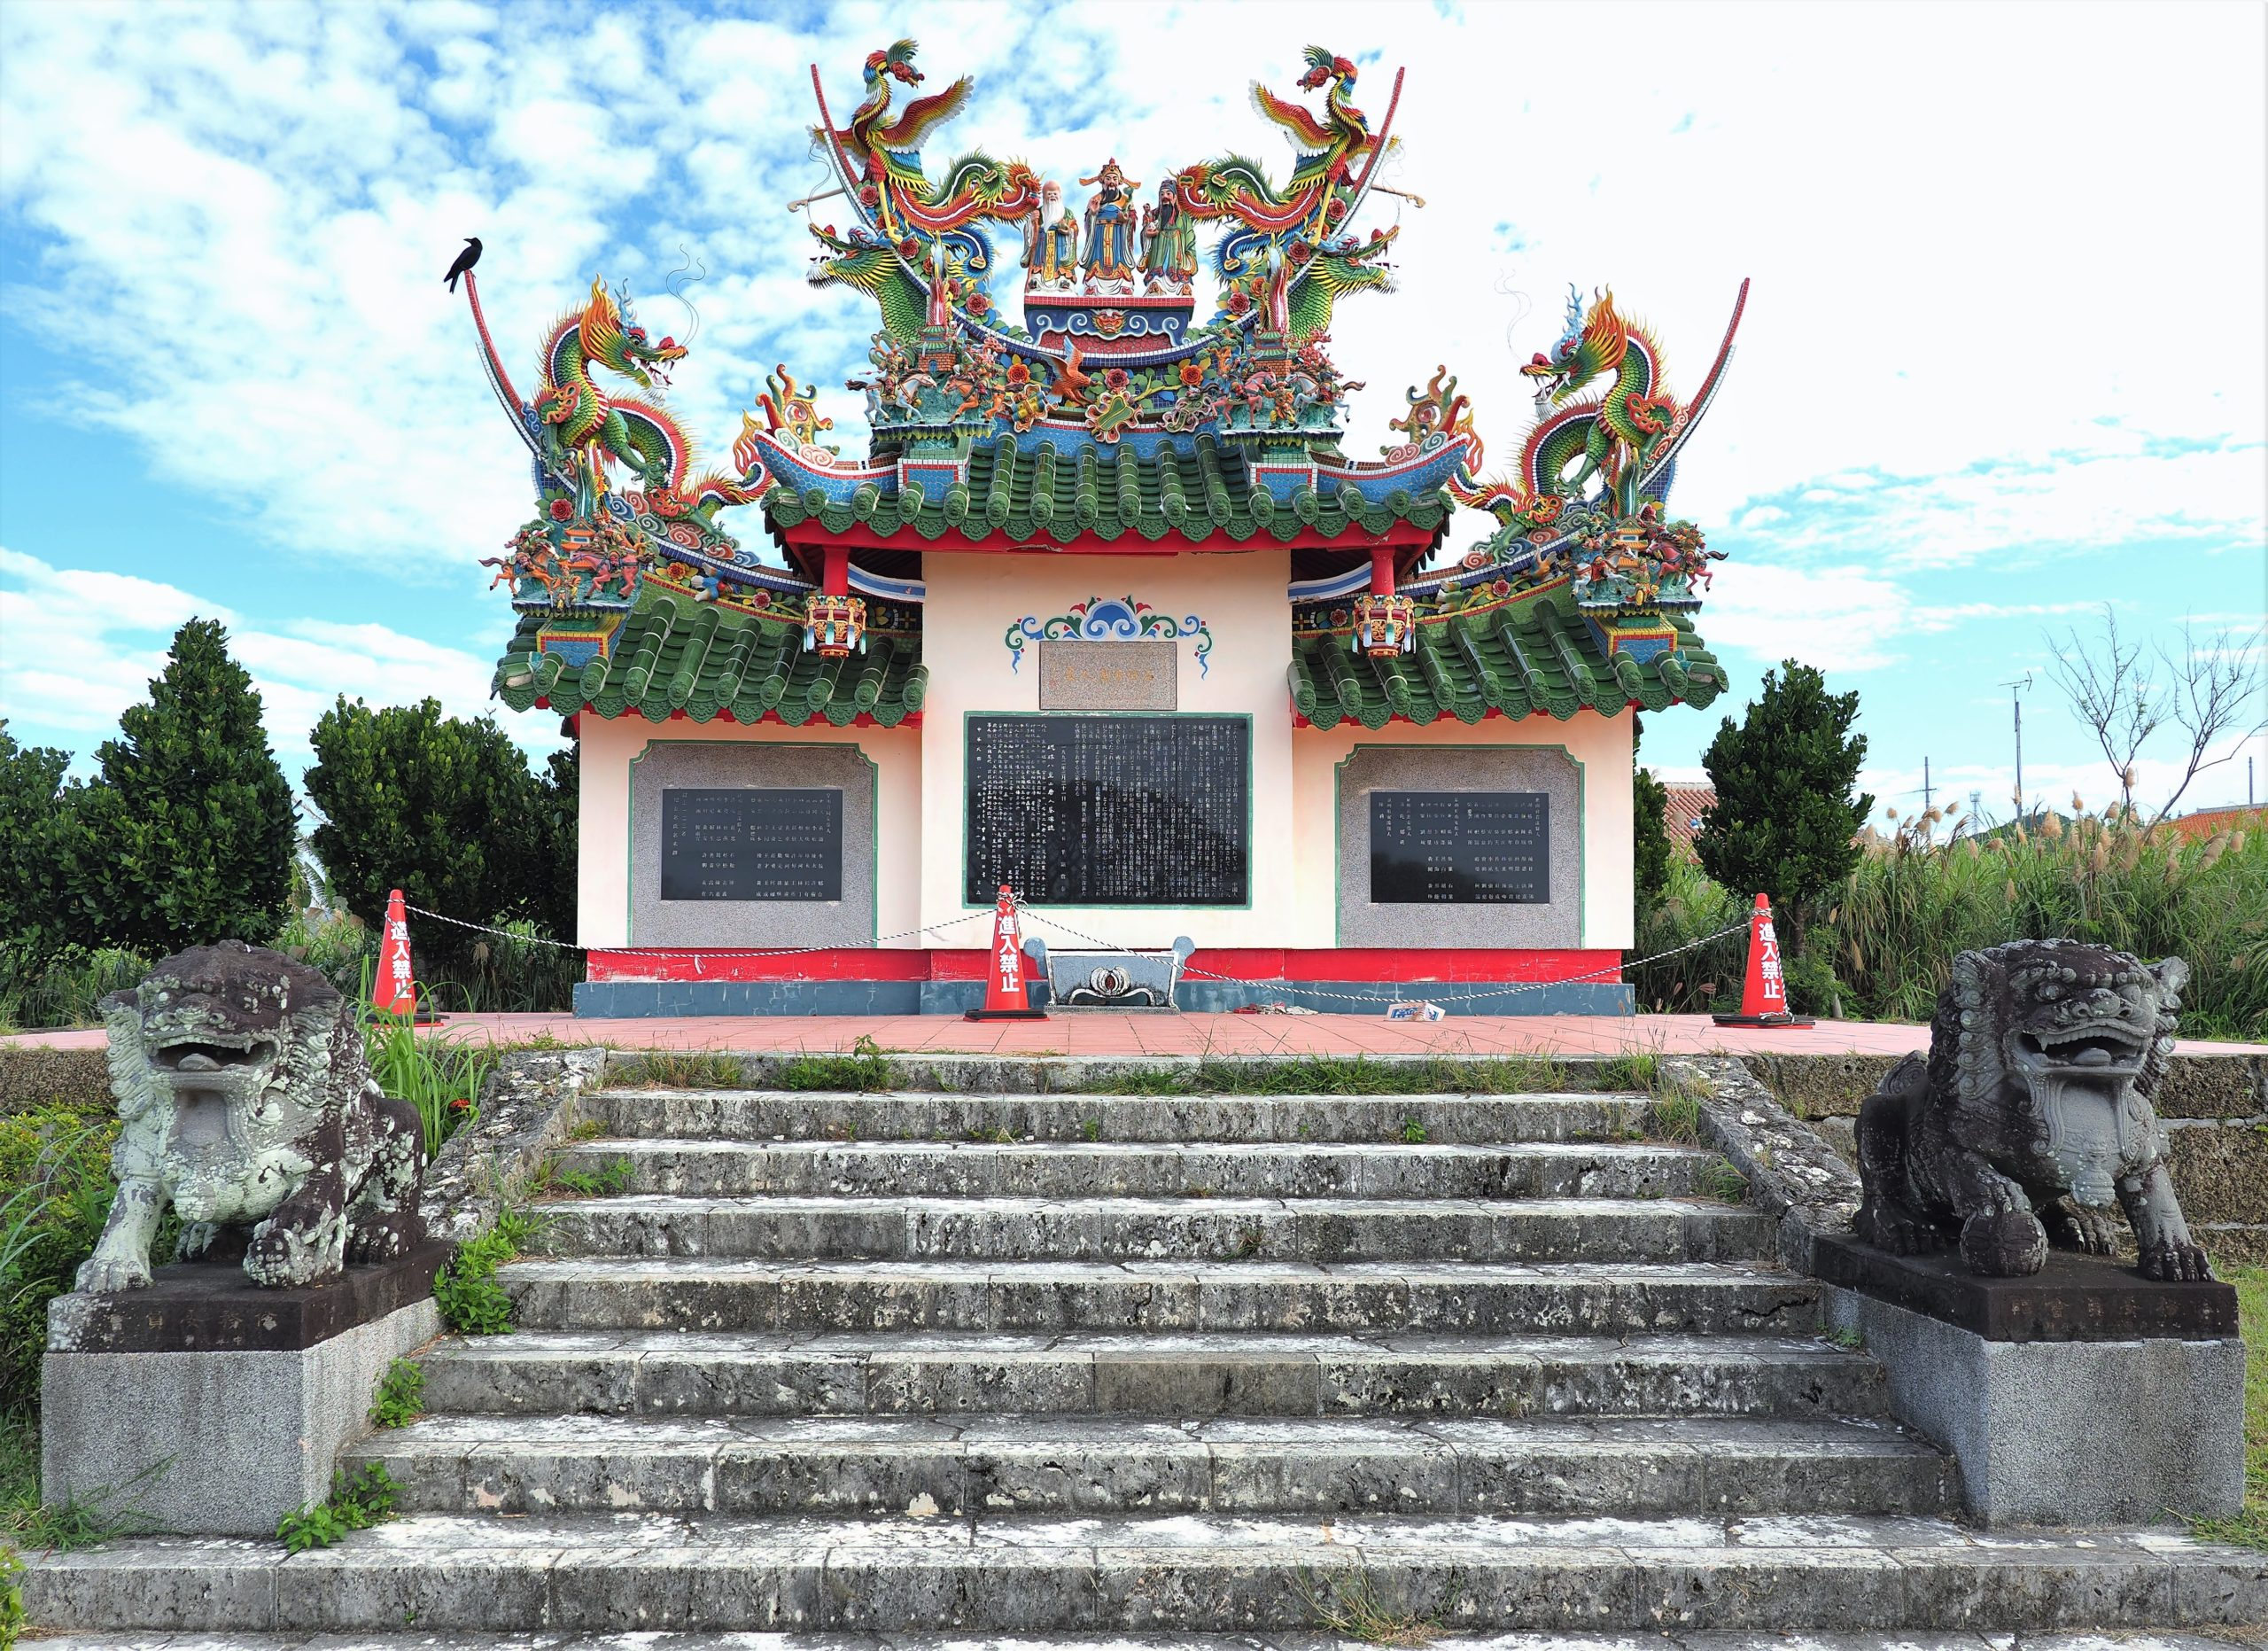 沖縄県 石垣島 唐人の墓